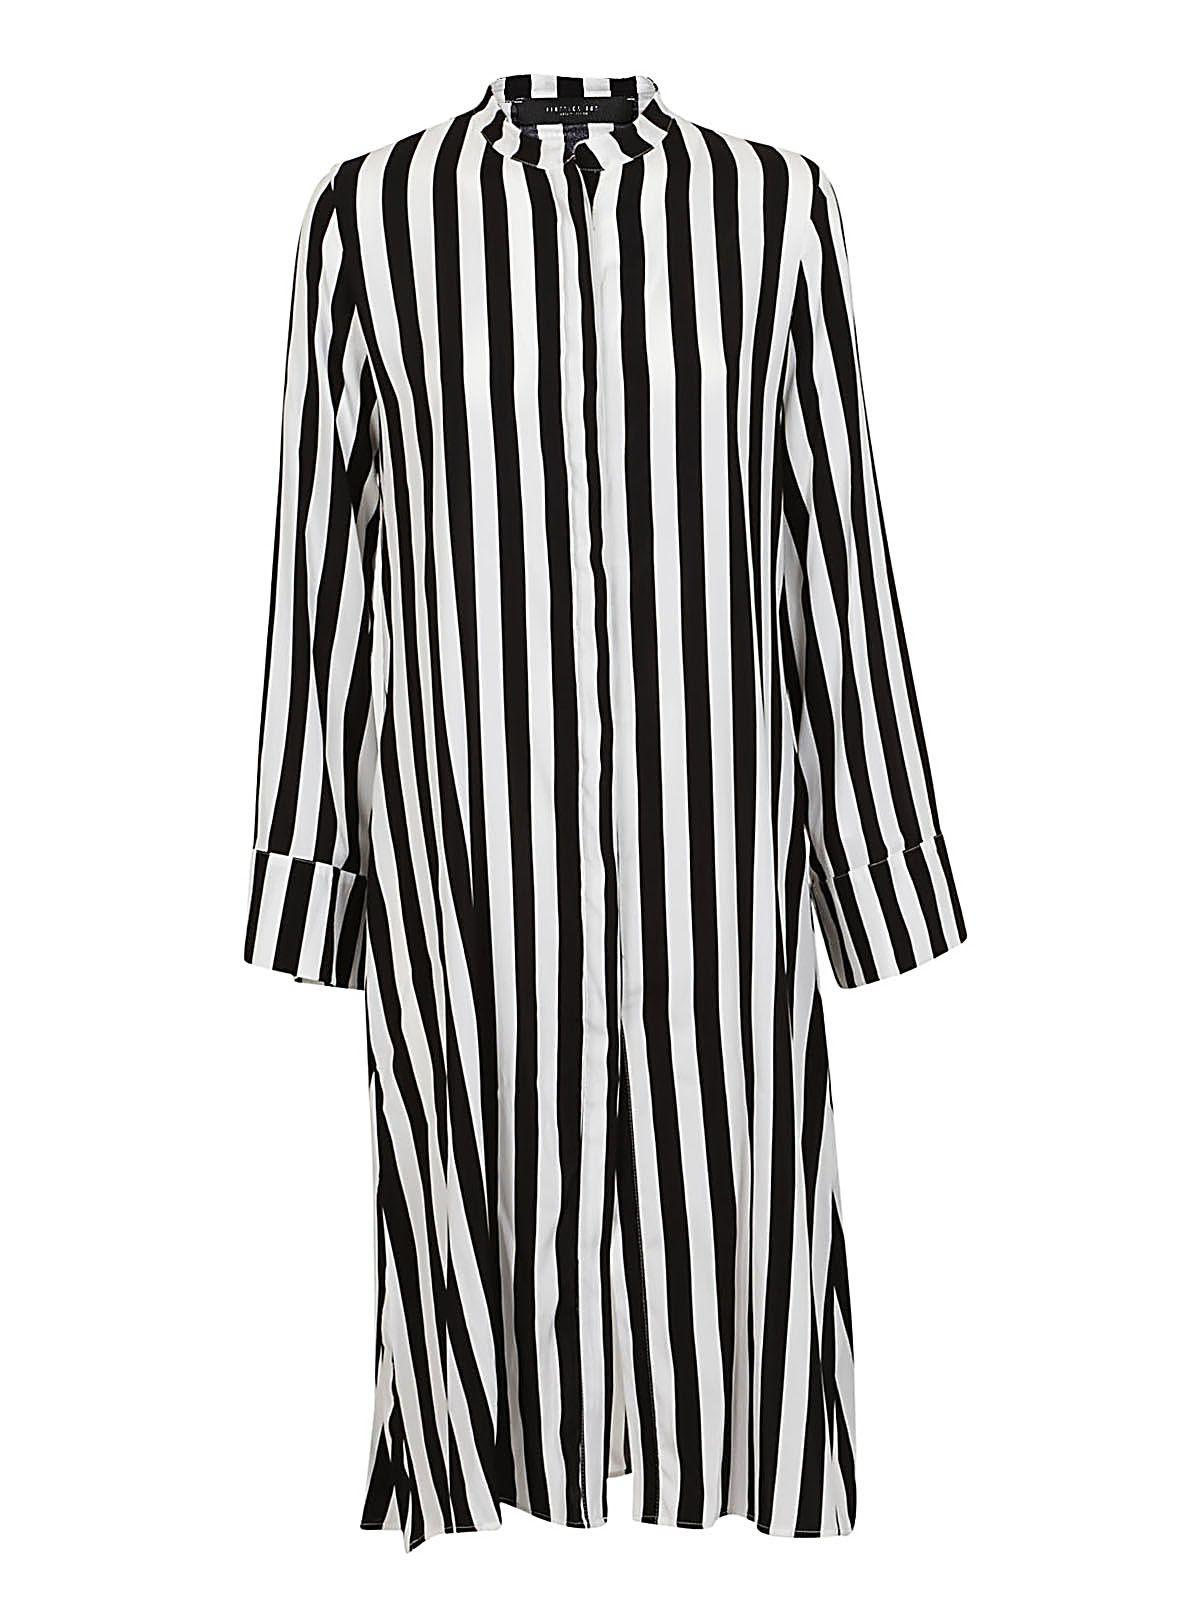 Federica Tosi Striped Loose-fit Dress In Bianco-nero